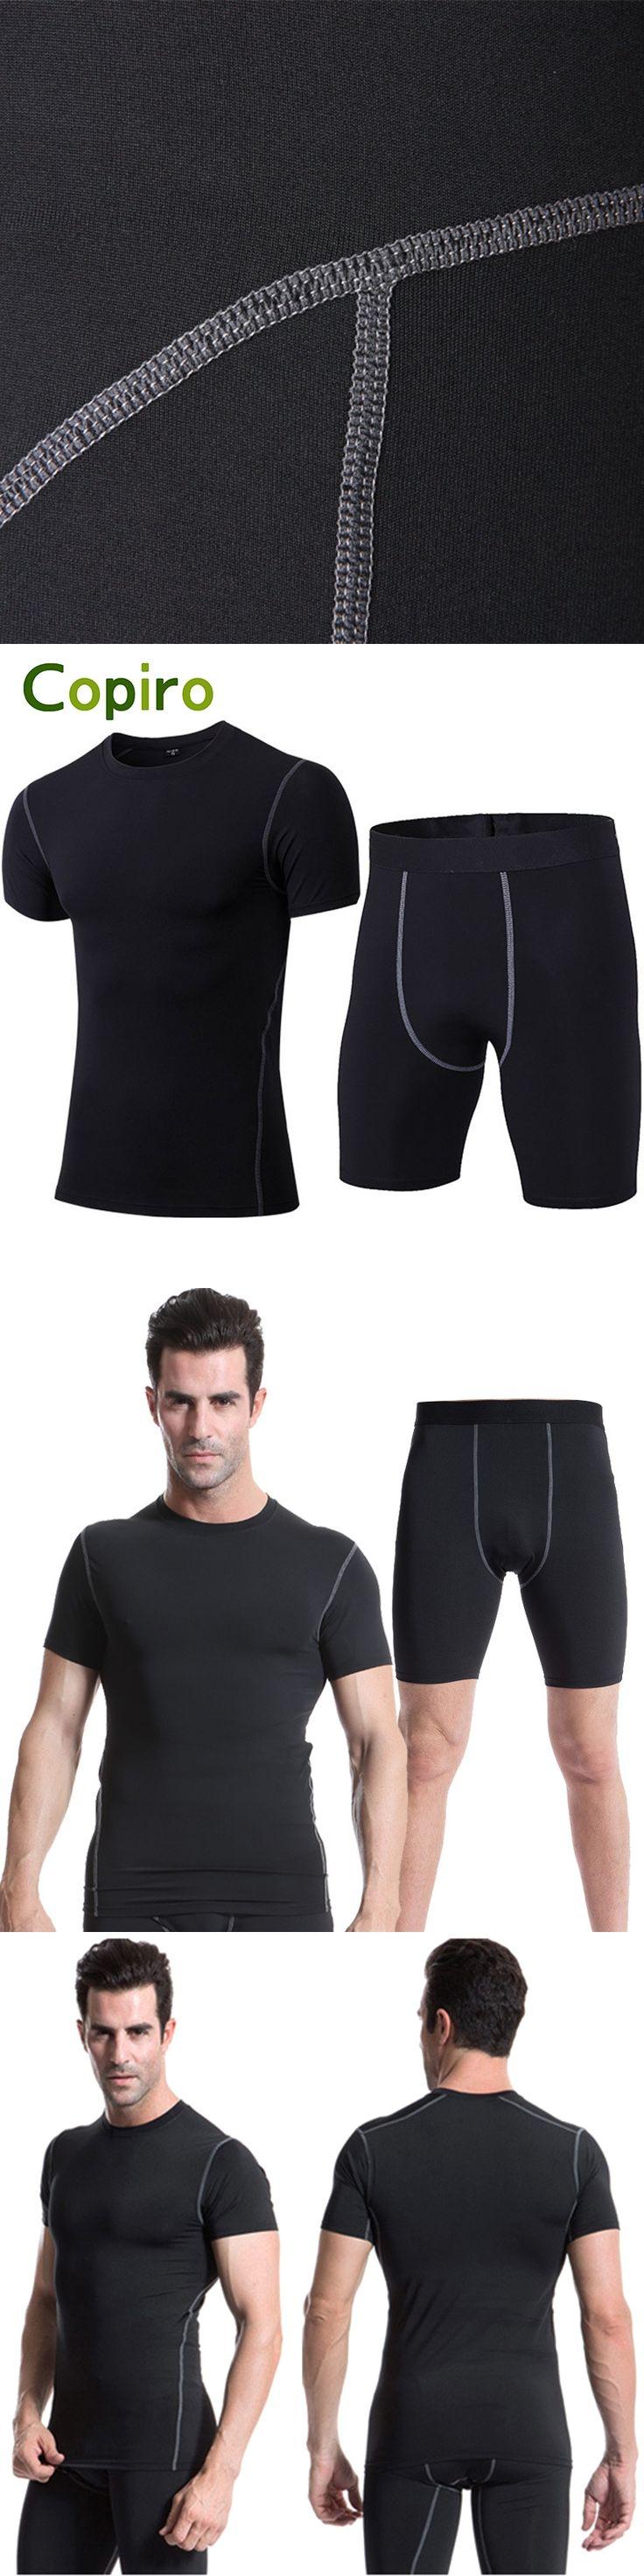 Copiro Compression Set Running Men Short Tight Training Tracksuits Quick Dry Jogging Homme Survetement Football Sport Suit